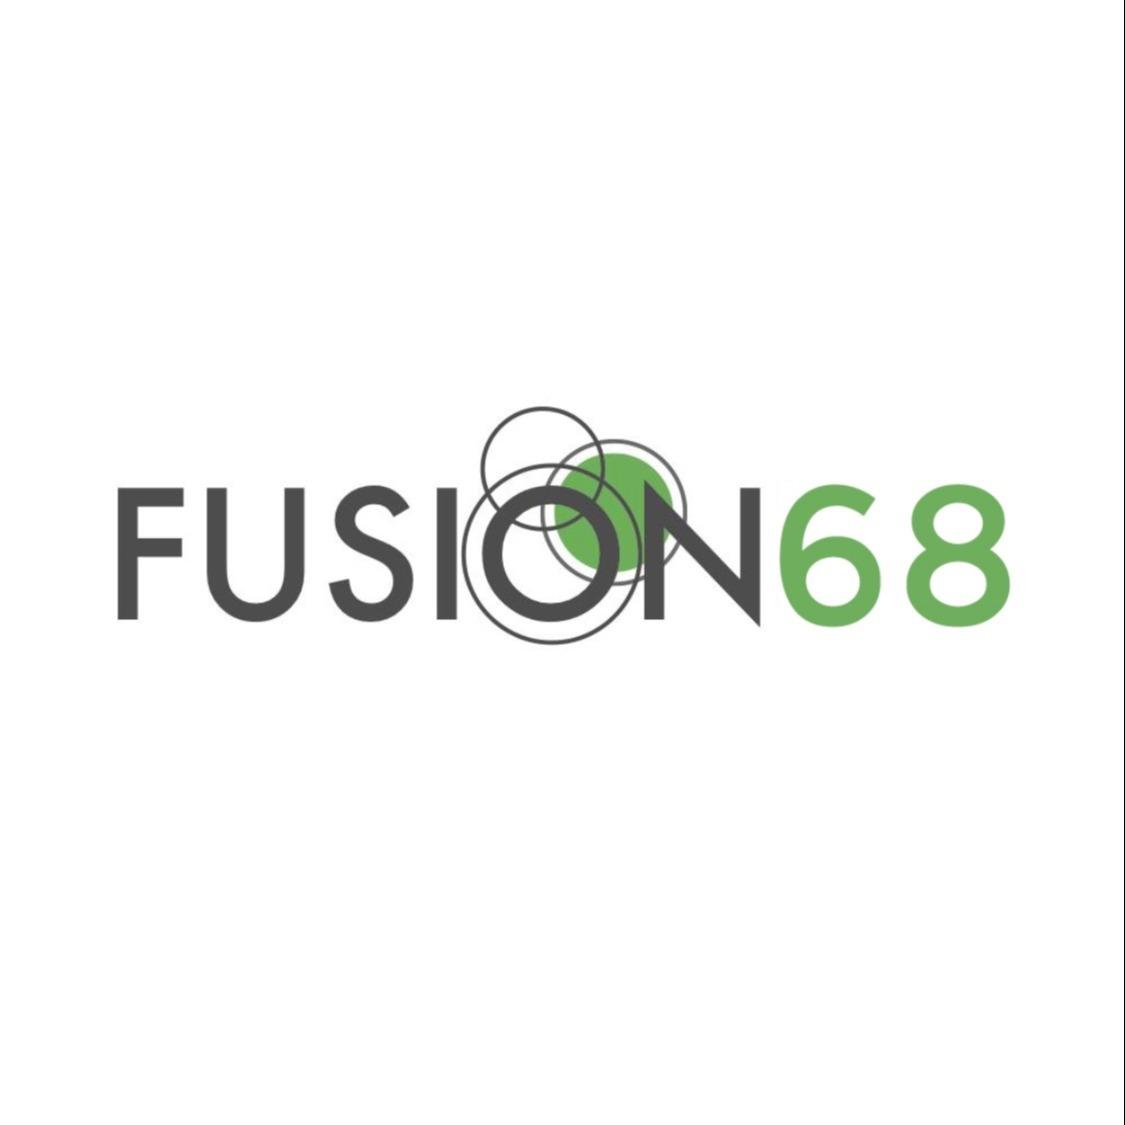 @fusion68_bctulsa Profile Image   Linktree